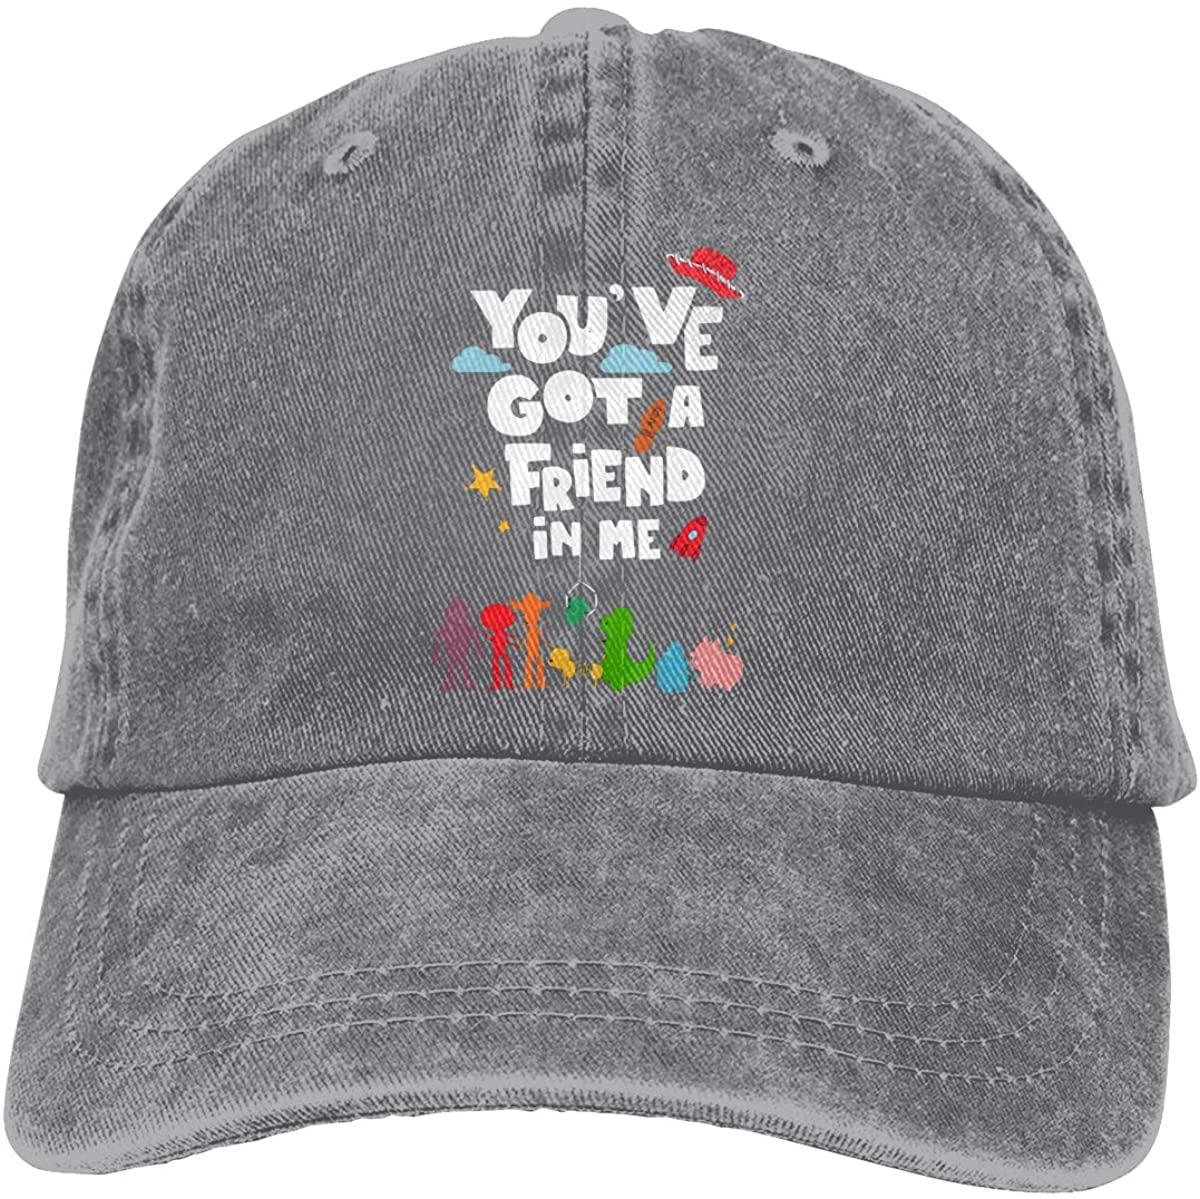 GOOANGUS Cute You've Got A Friend in Me Adjustable Unisex Hat Baseball Caps Black